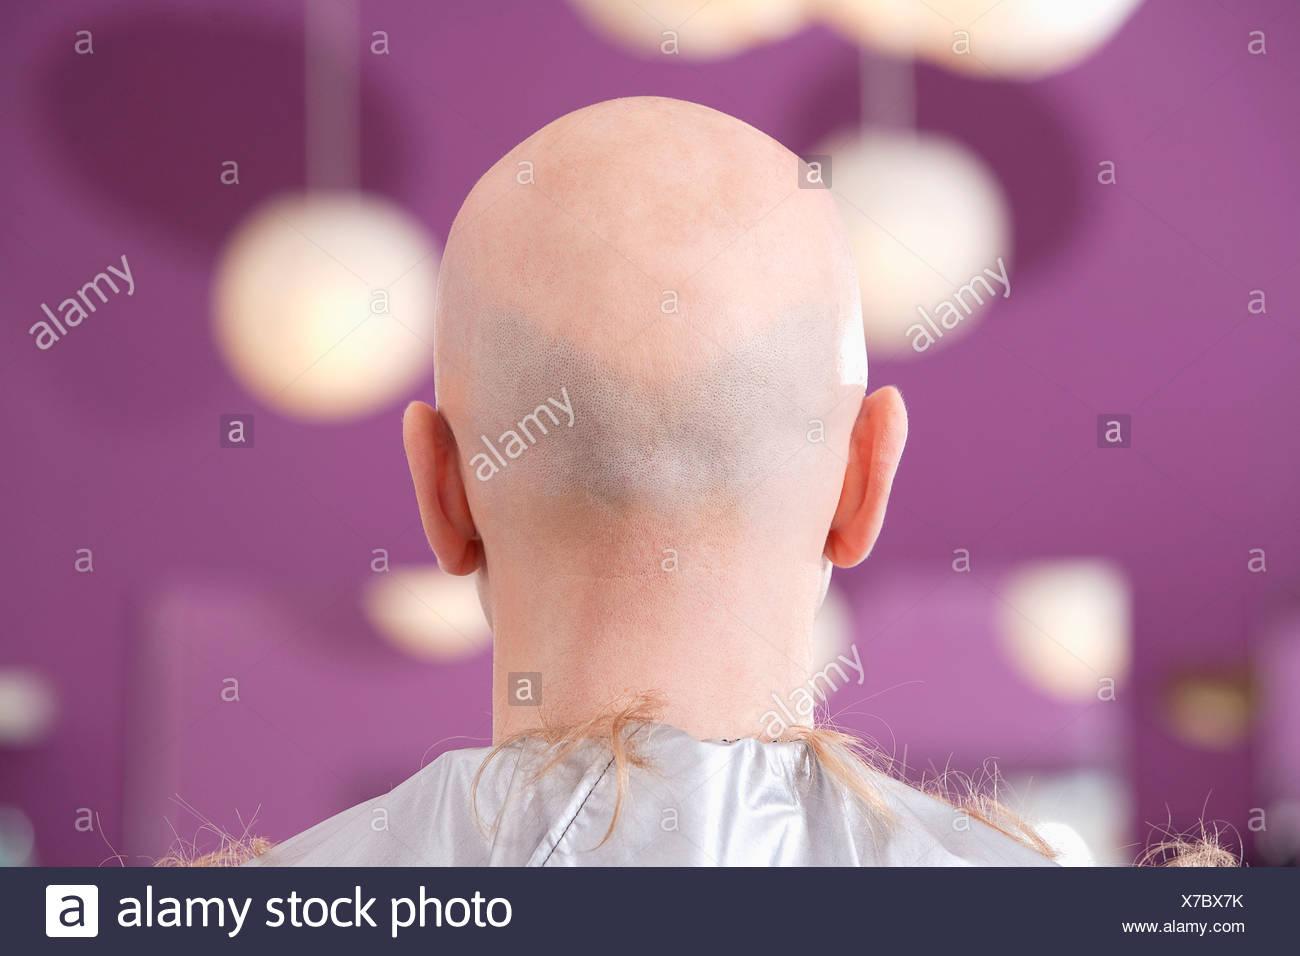 rear view of bald man at hair dresser - Stock Image